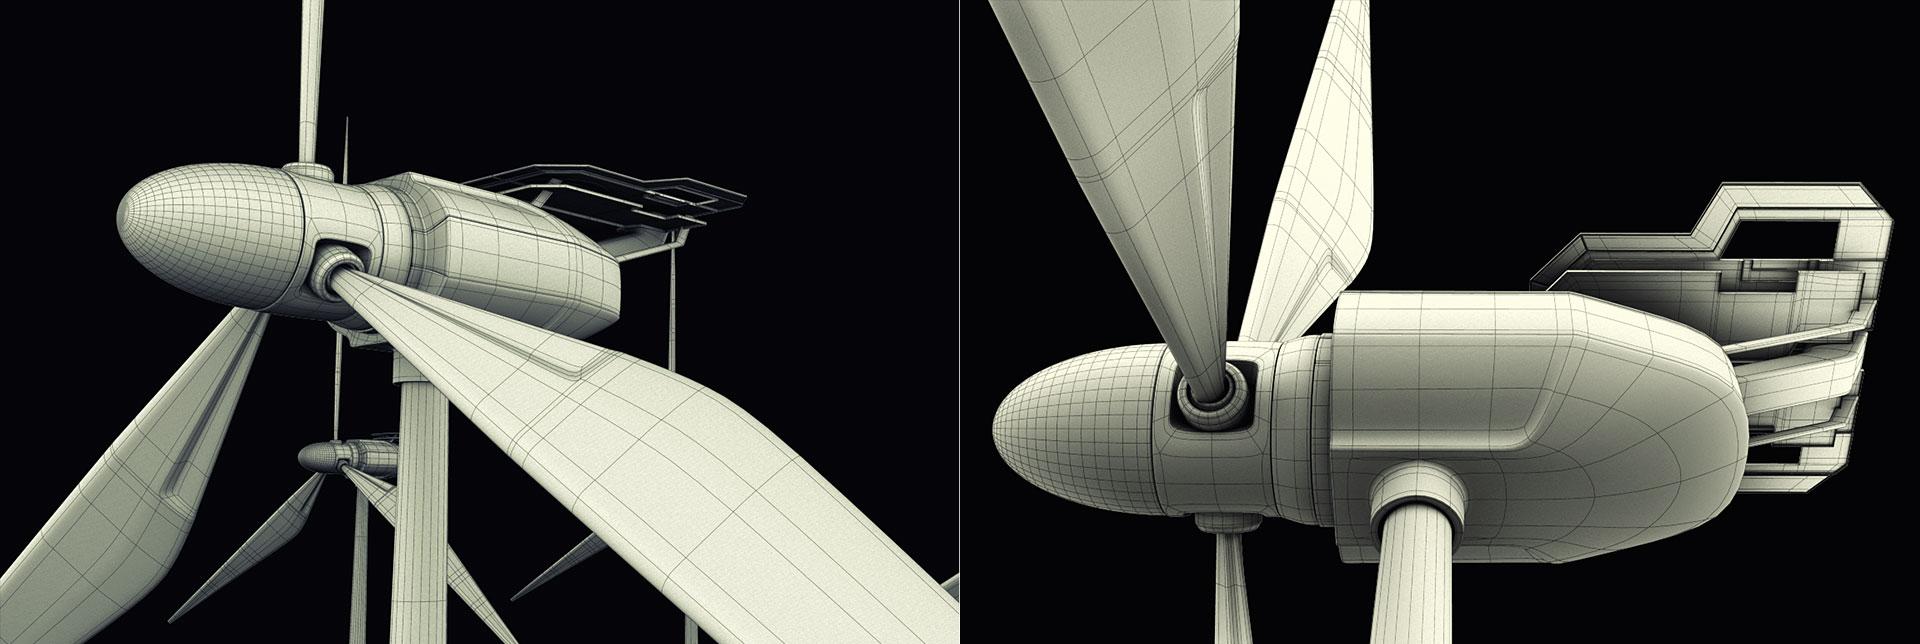 Greenpeace-TV-Advert-Nitin-Design